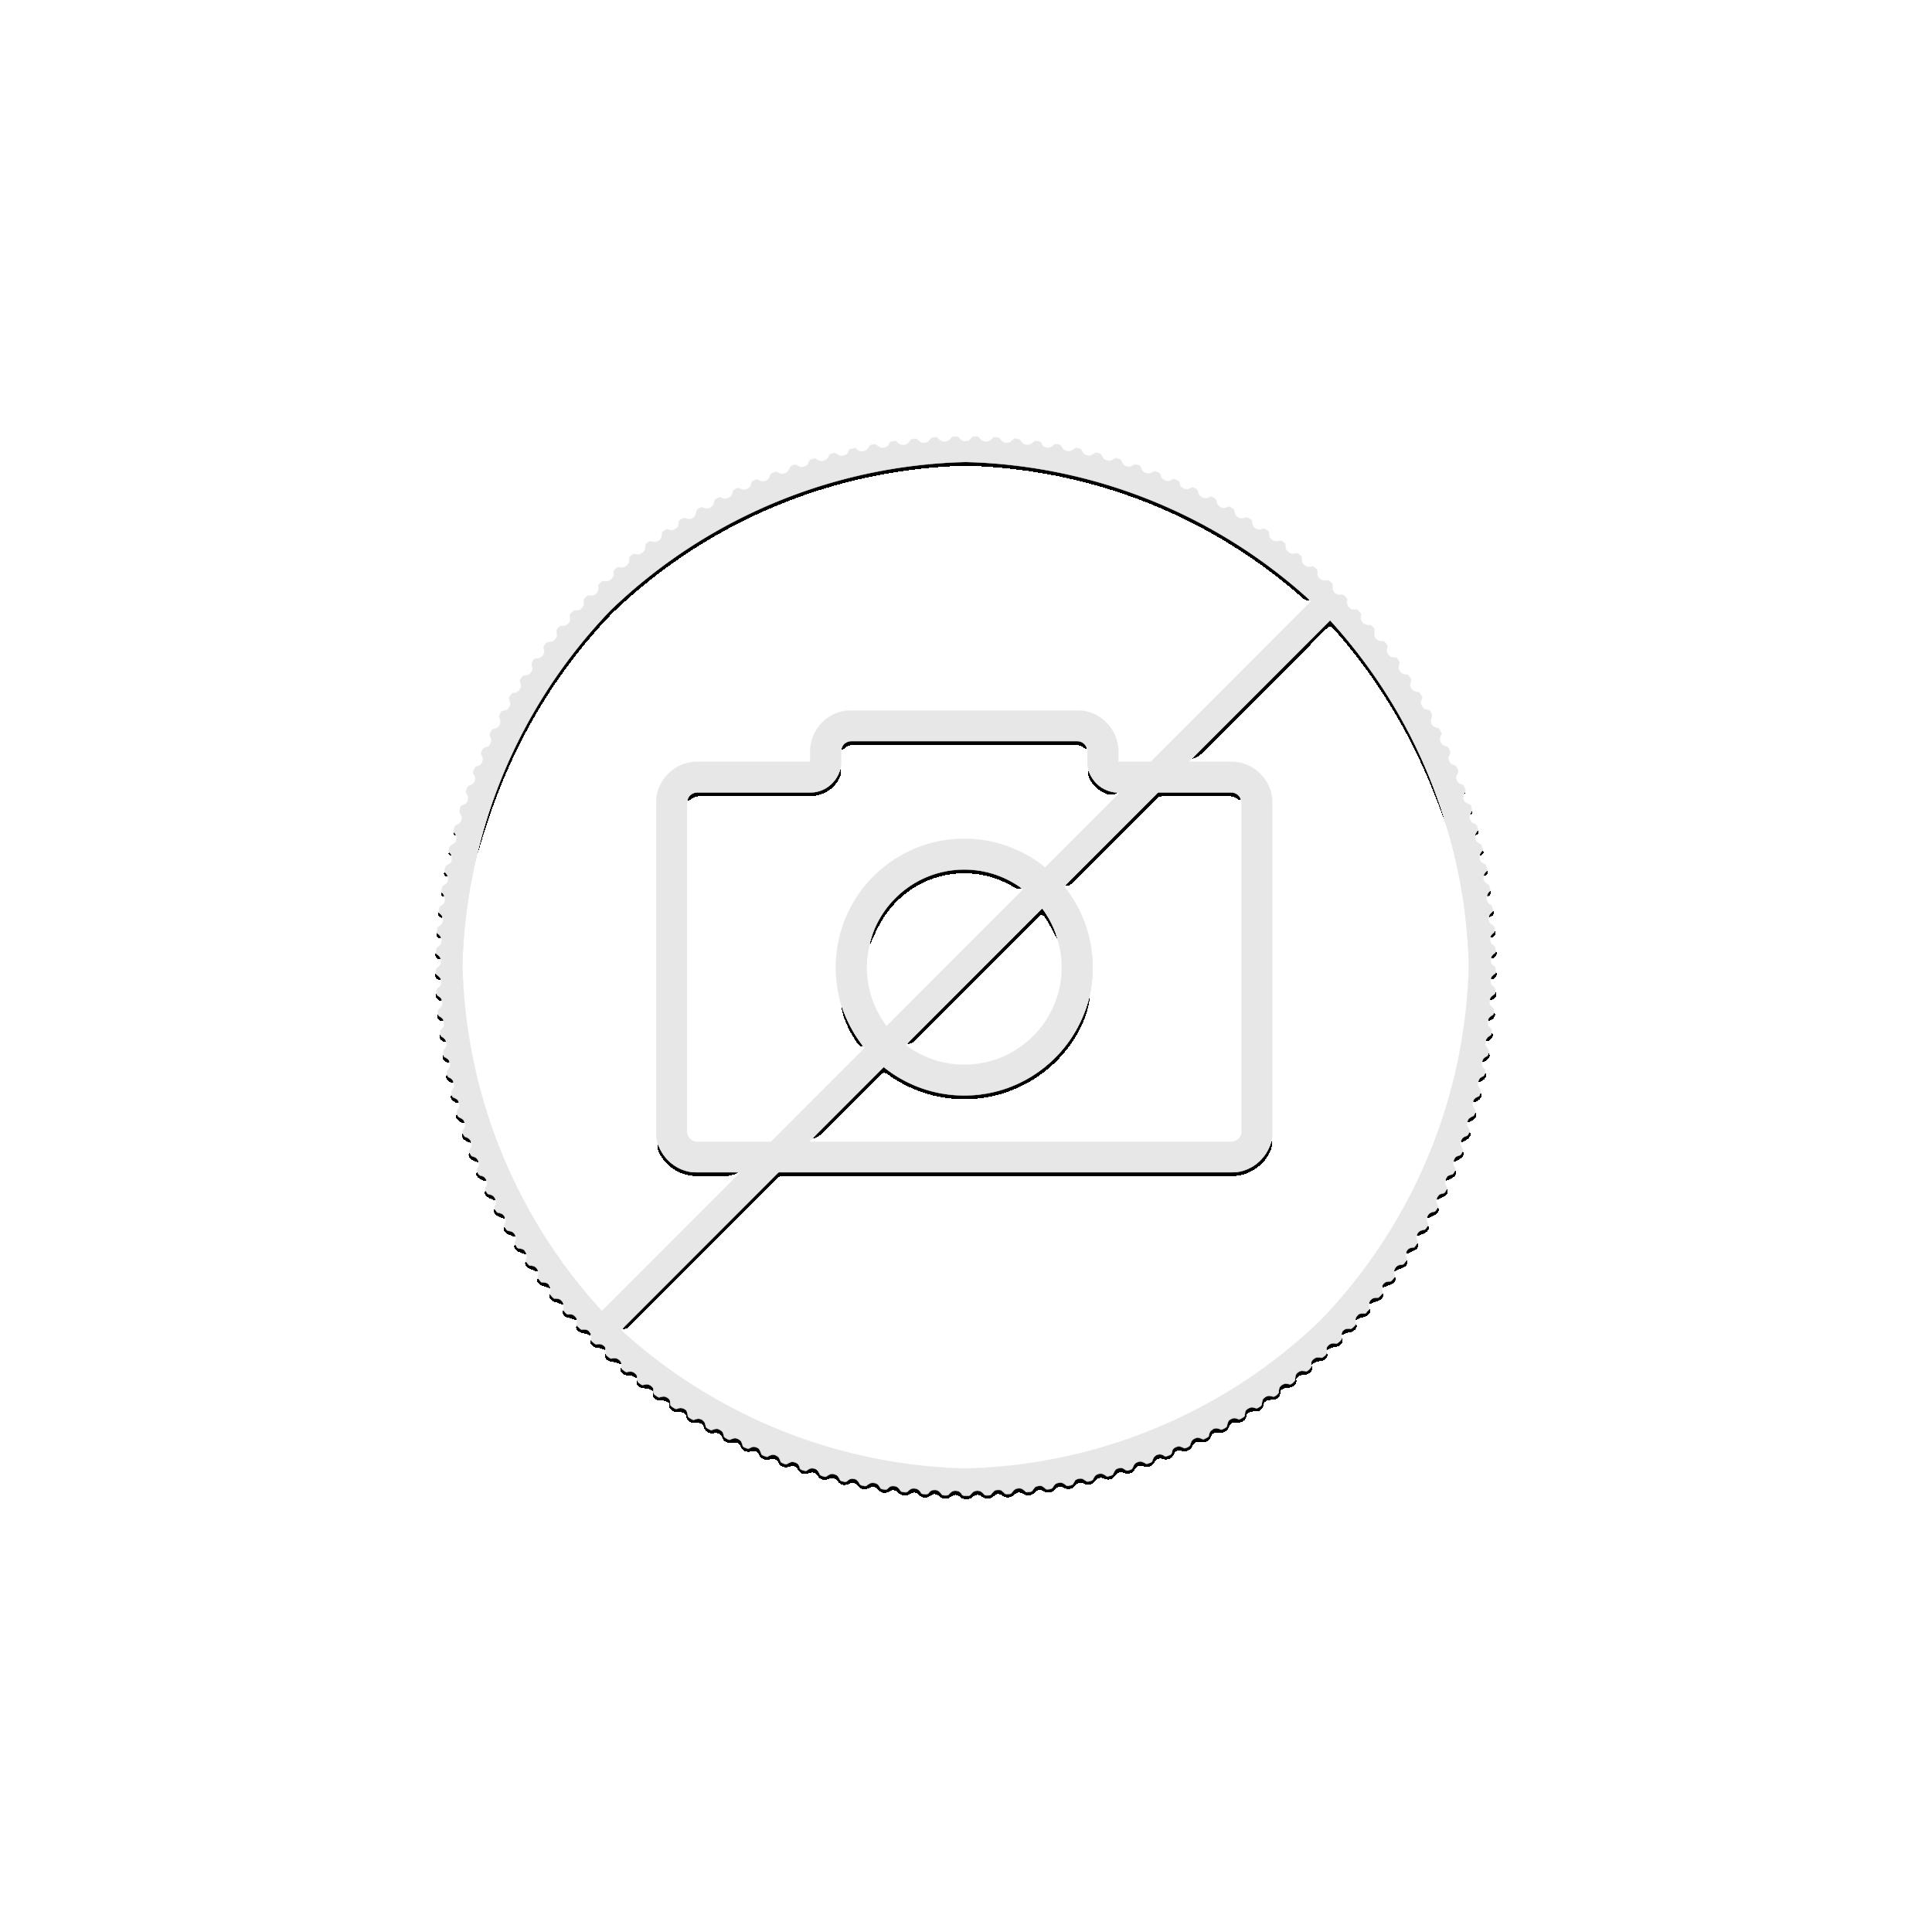 1 Troy ounce zilveren munt Lunar 2021 Proof